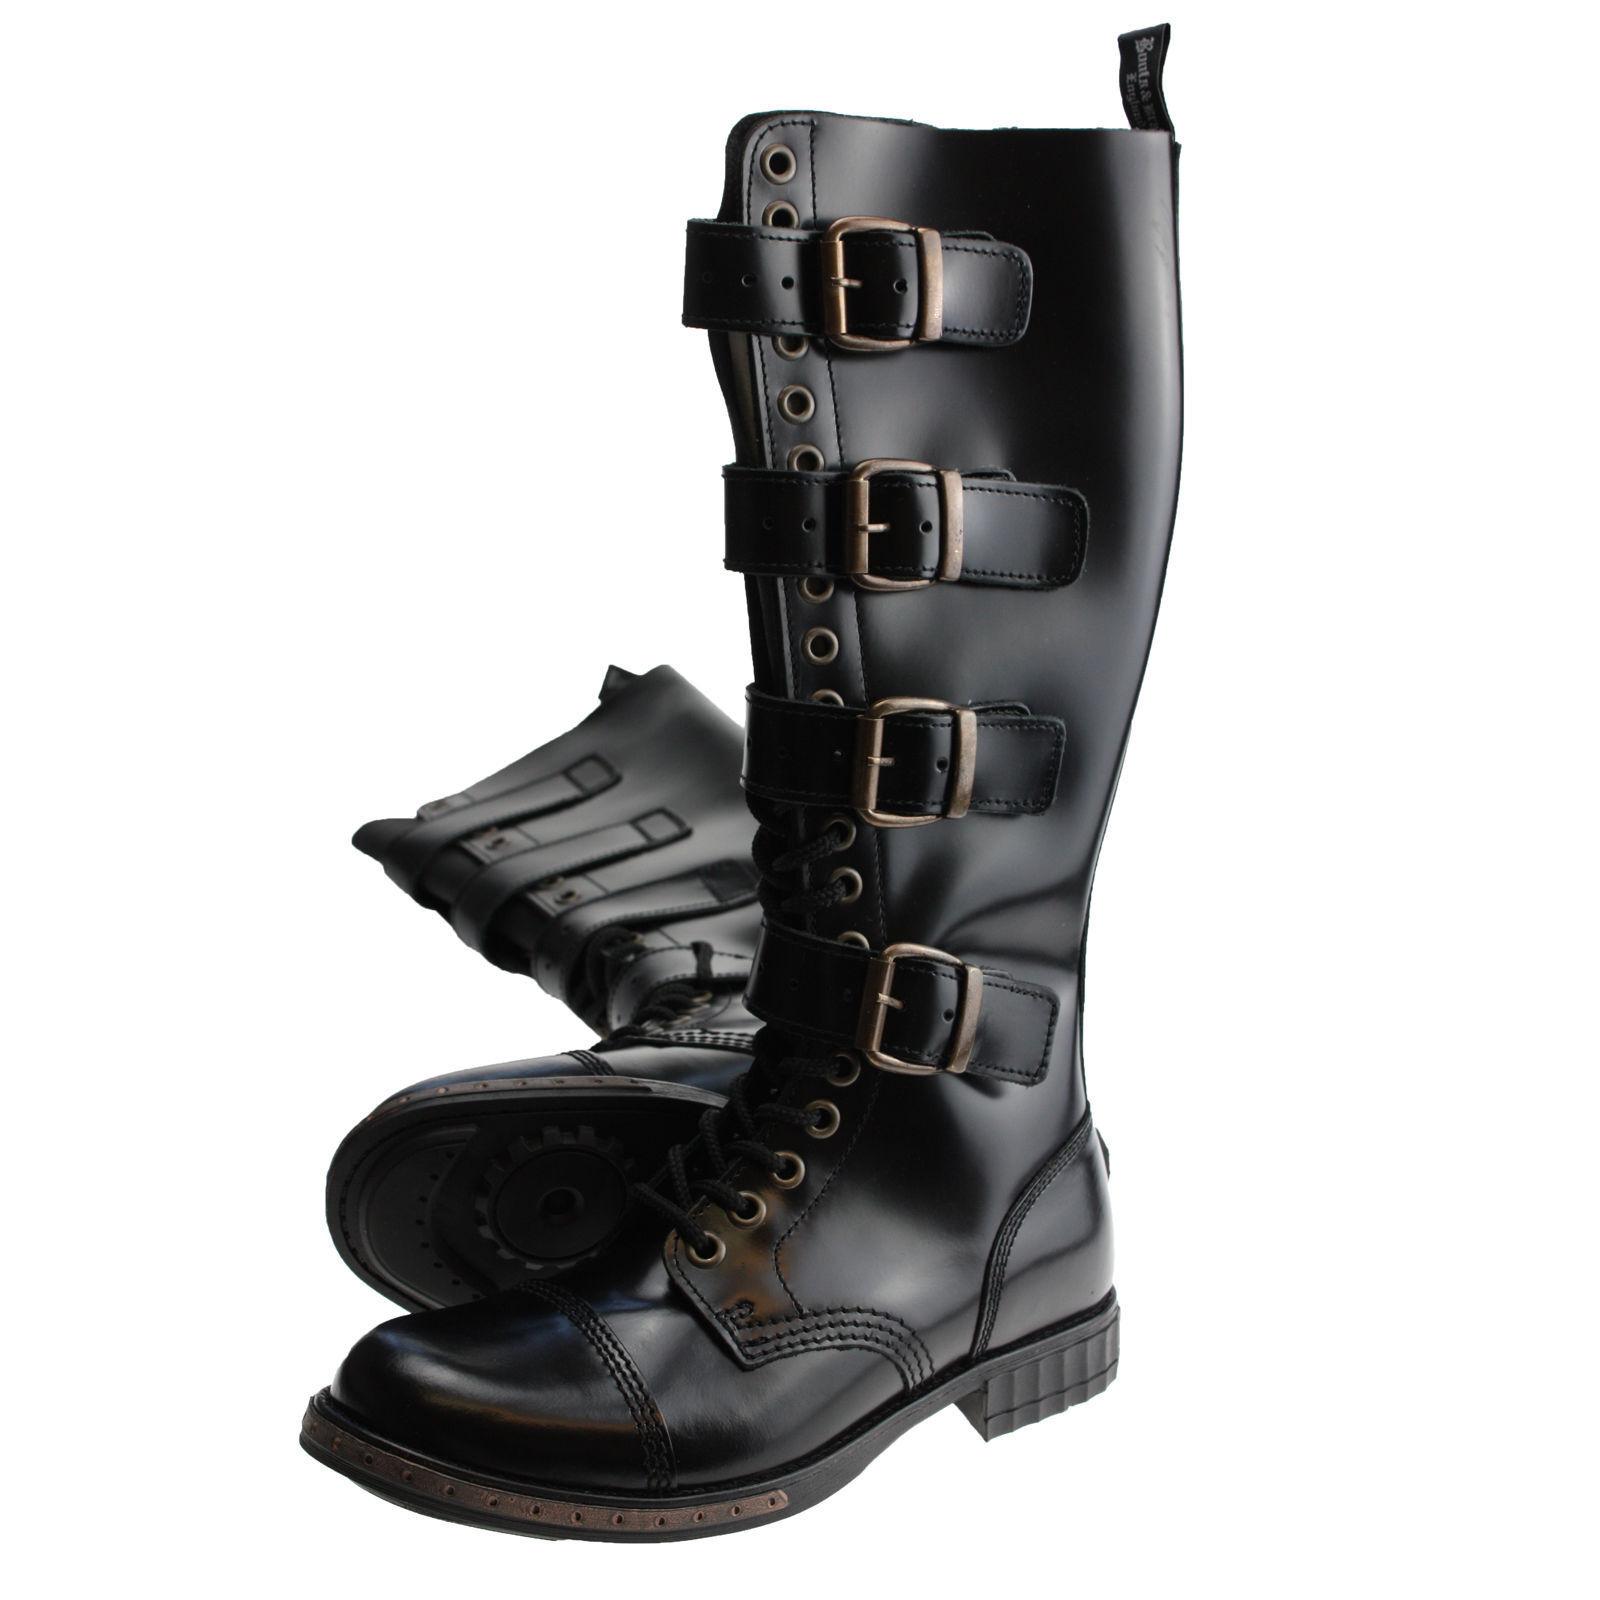 botas and Braces 20 Loch 4 Bronce Schnallen Steampunk Stiefel Negro Bronce 4 ohne Stahl 55a09a